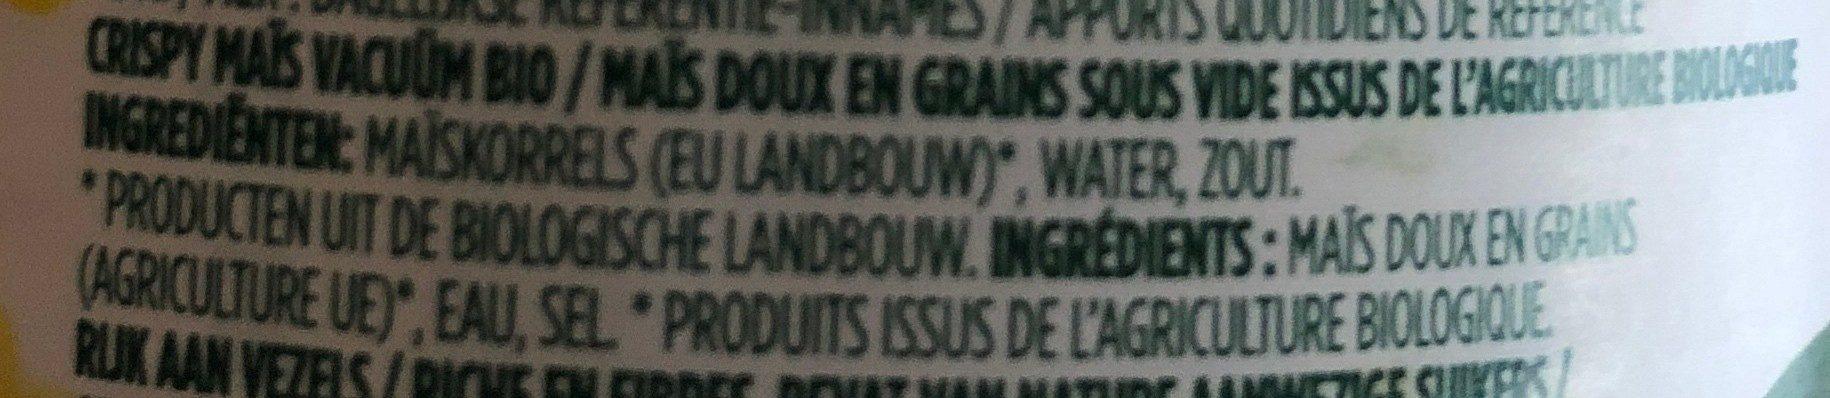 Maizbio - Ingredients - fr